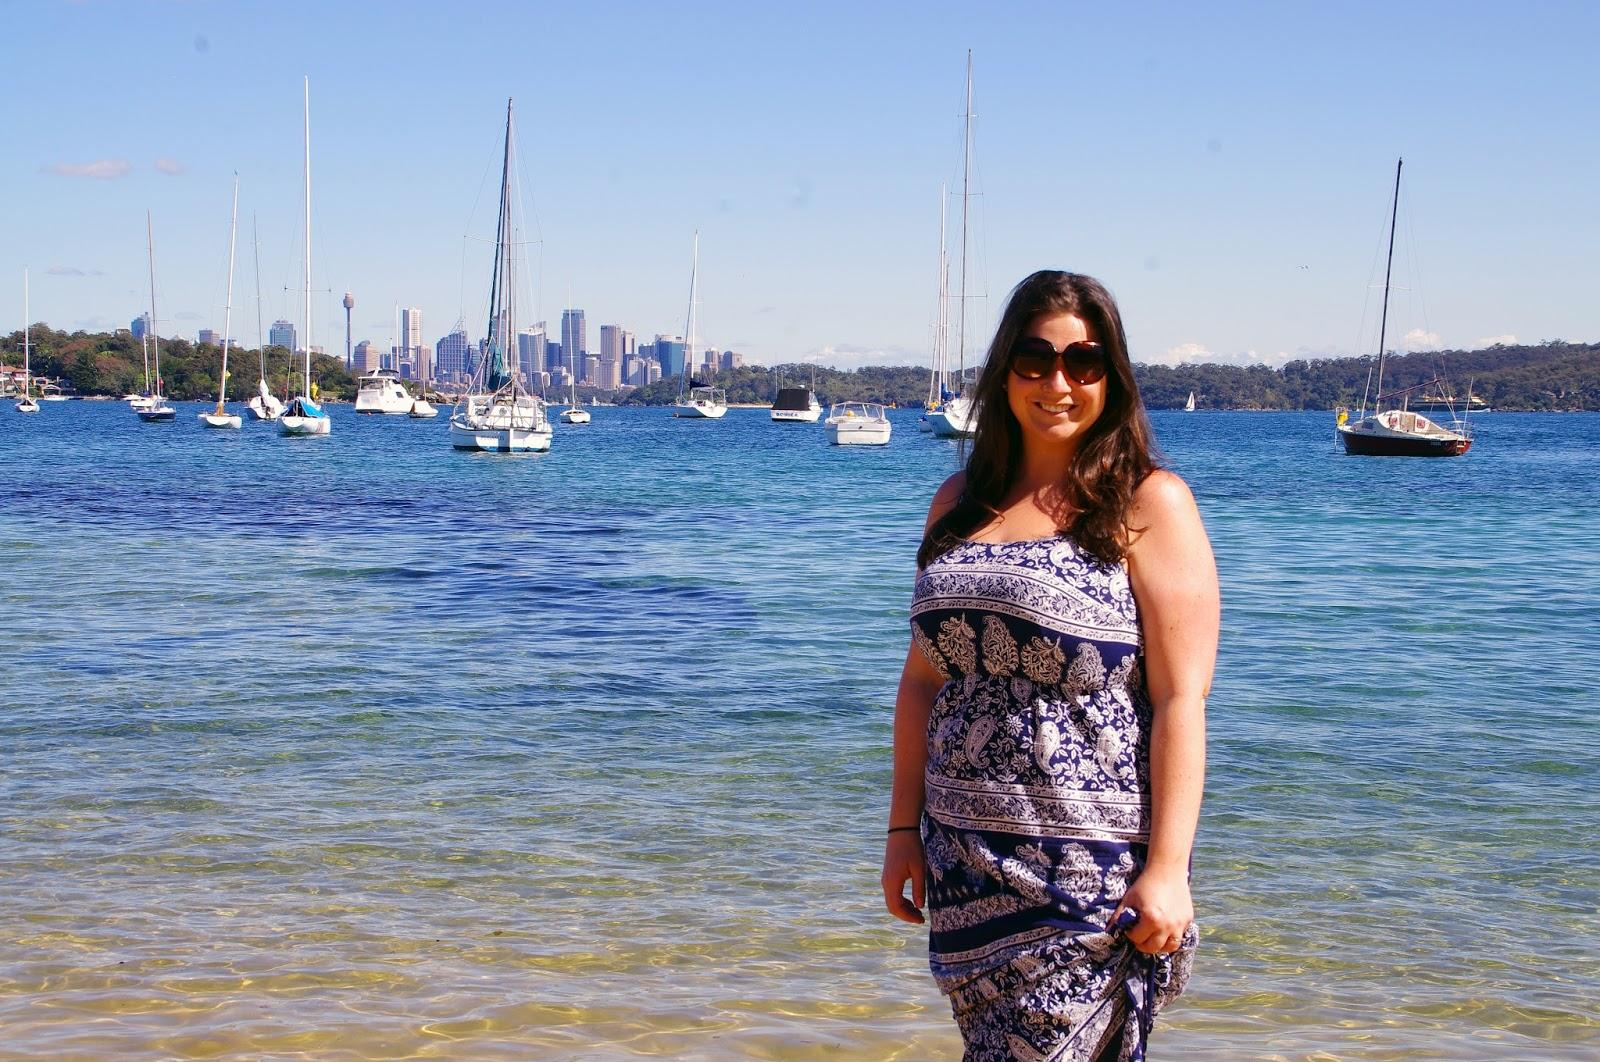 the Aussie flashpacker in Watsons Bay